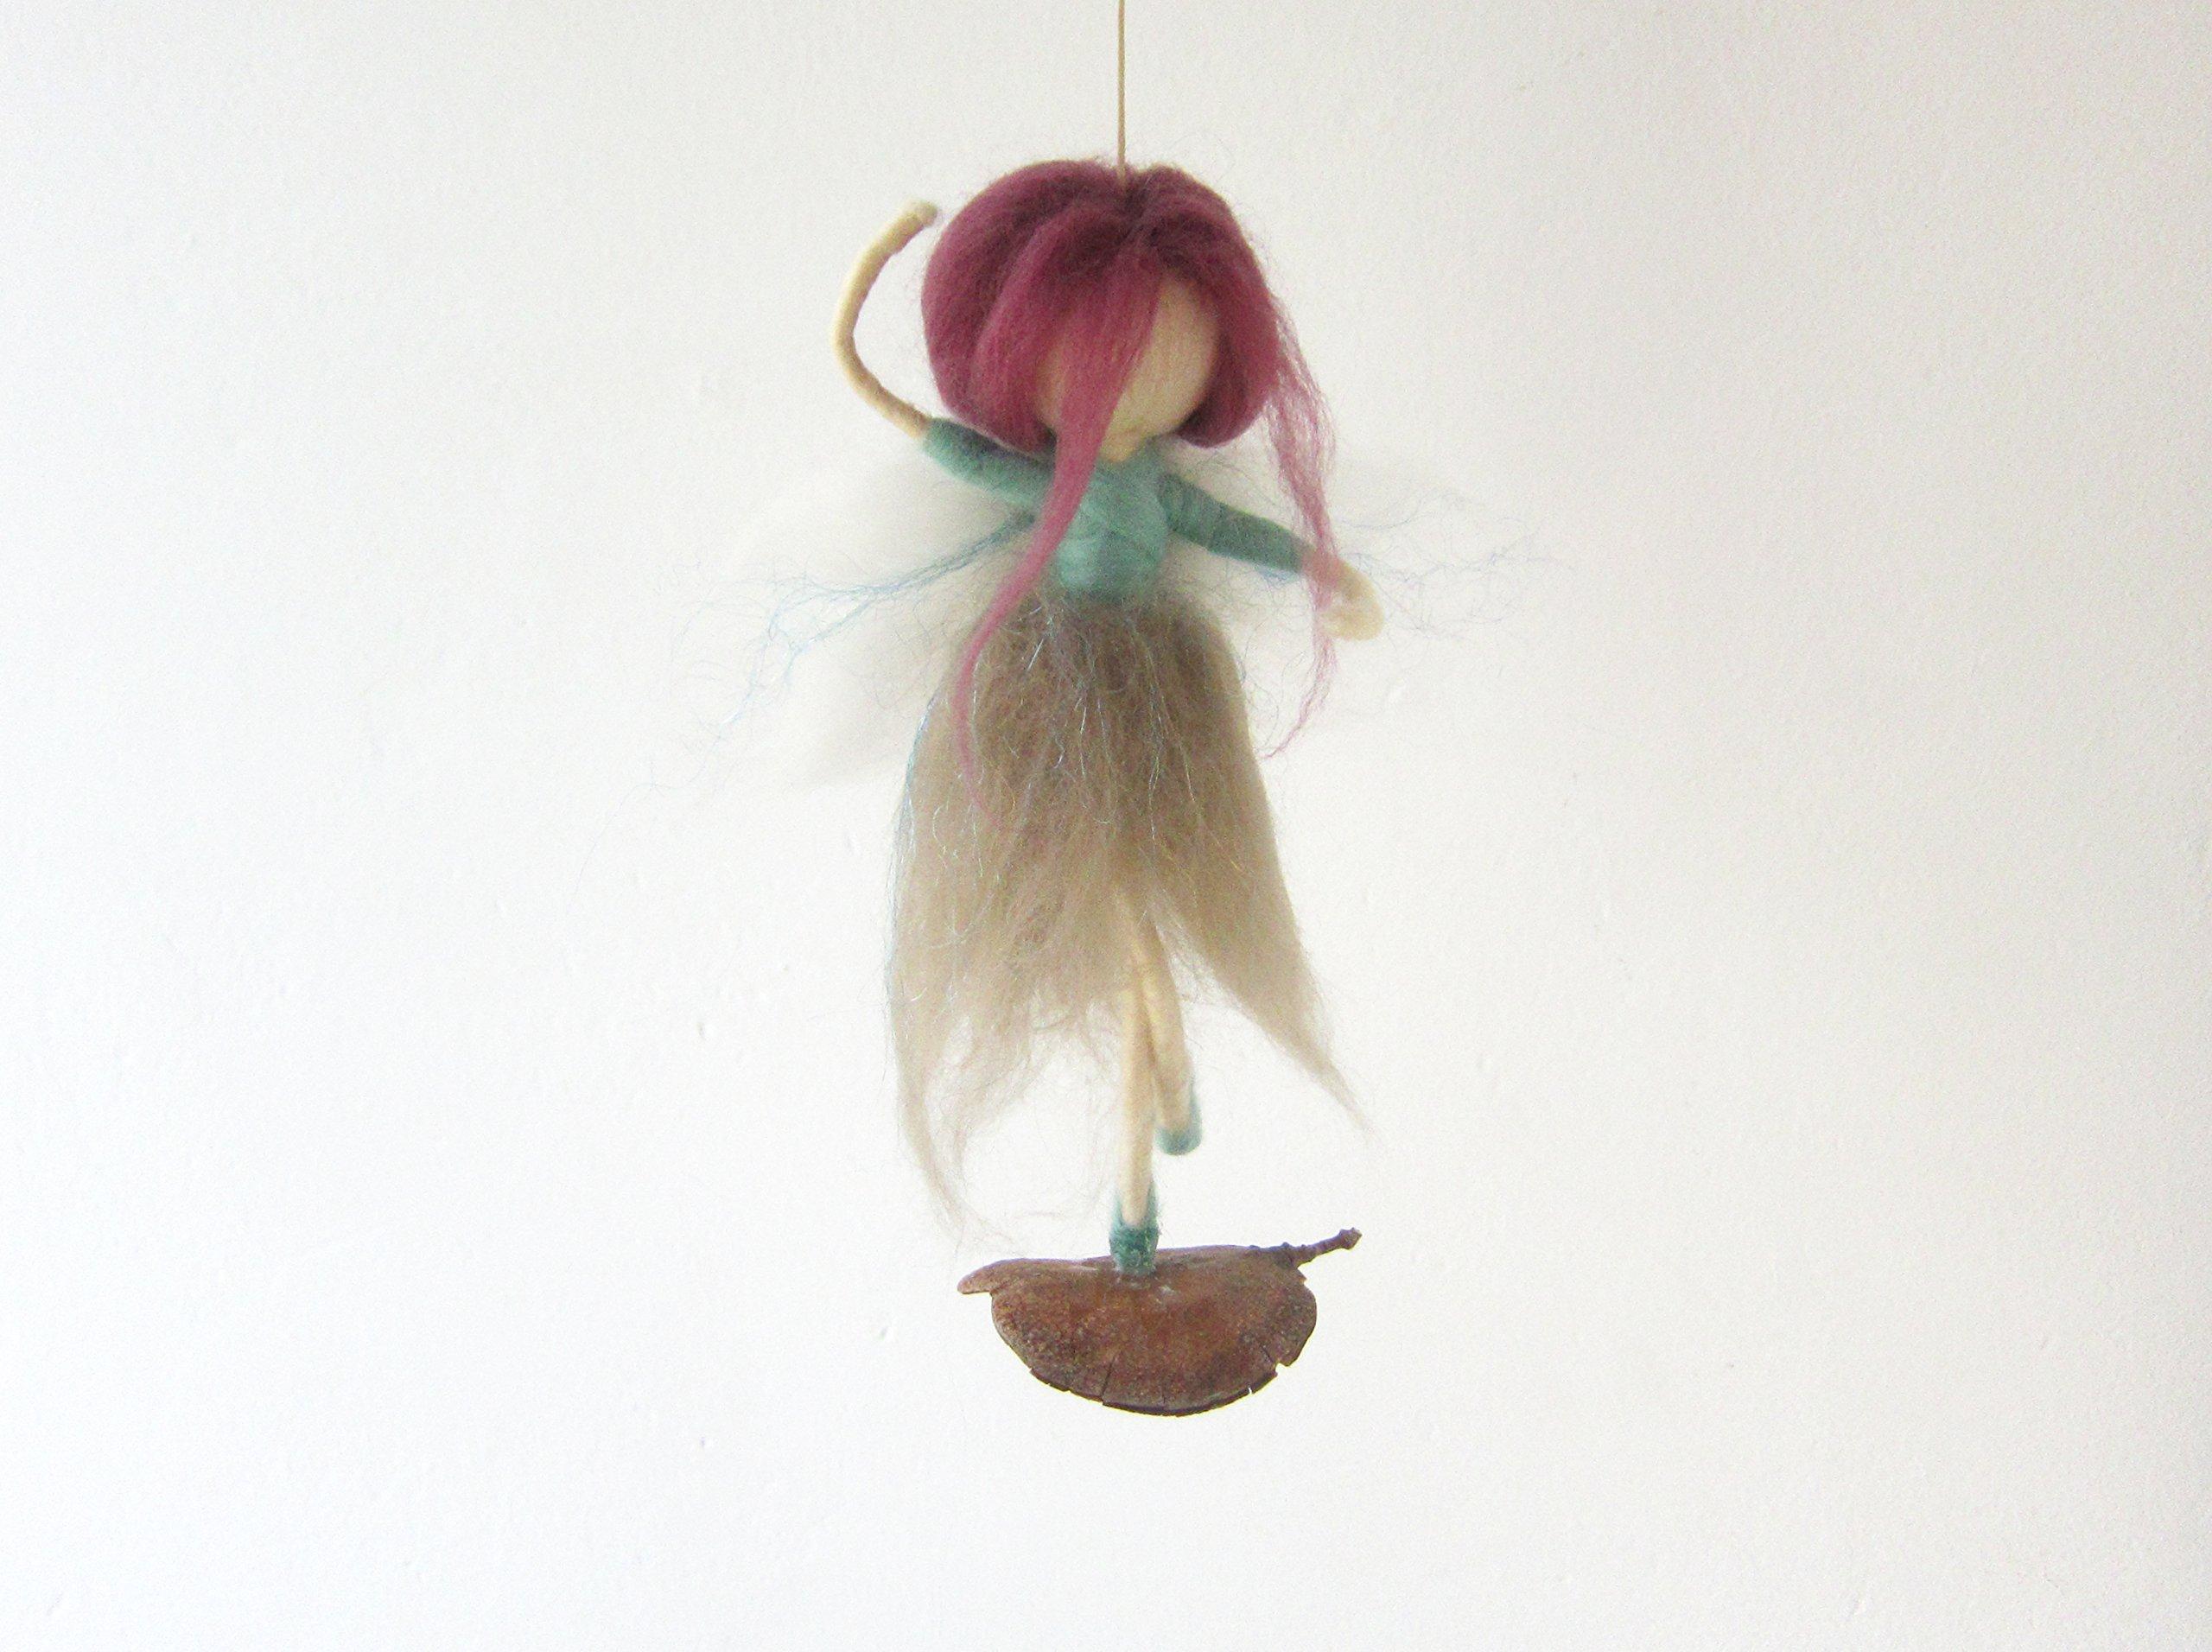 Needle Felted Ballerina Fairy Dancing On A Tree Pod, For Home Decor Or Girl Nursery, Fantasy Whimsical Handmade Figurine Art Doll